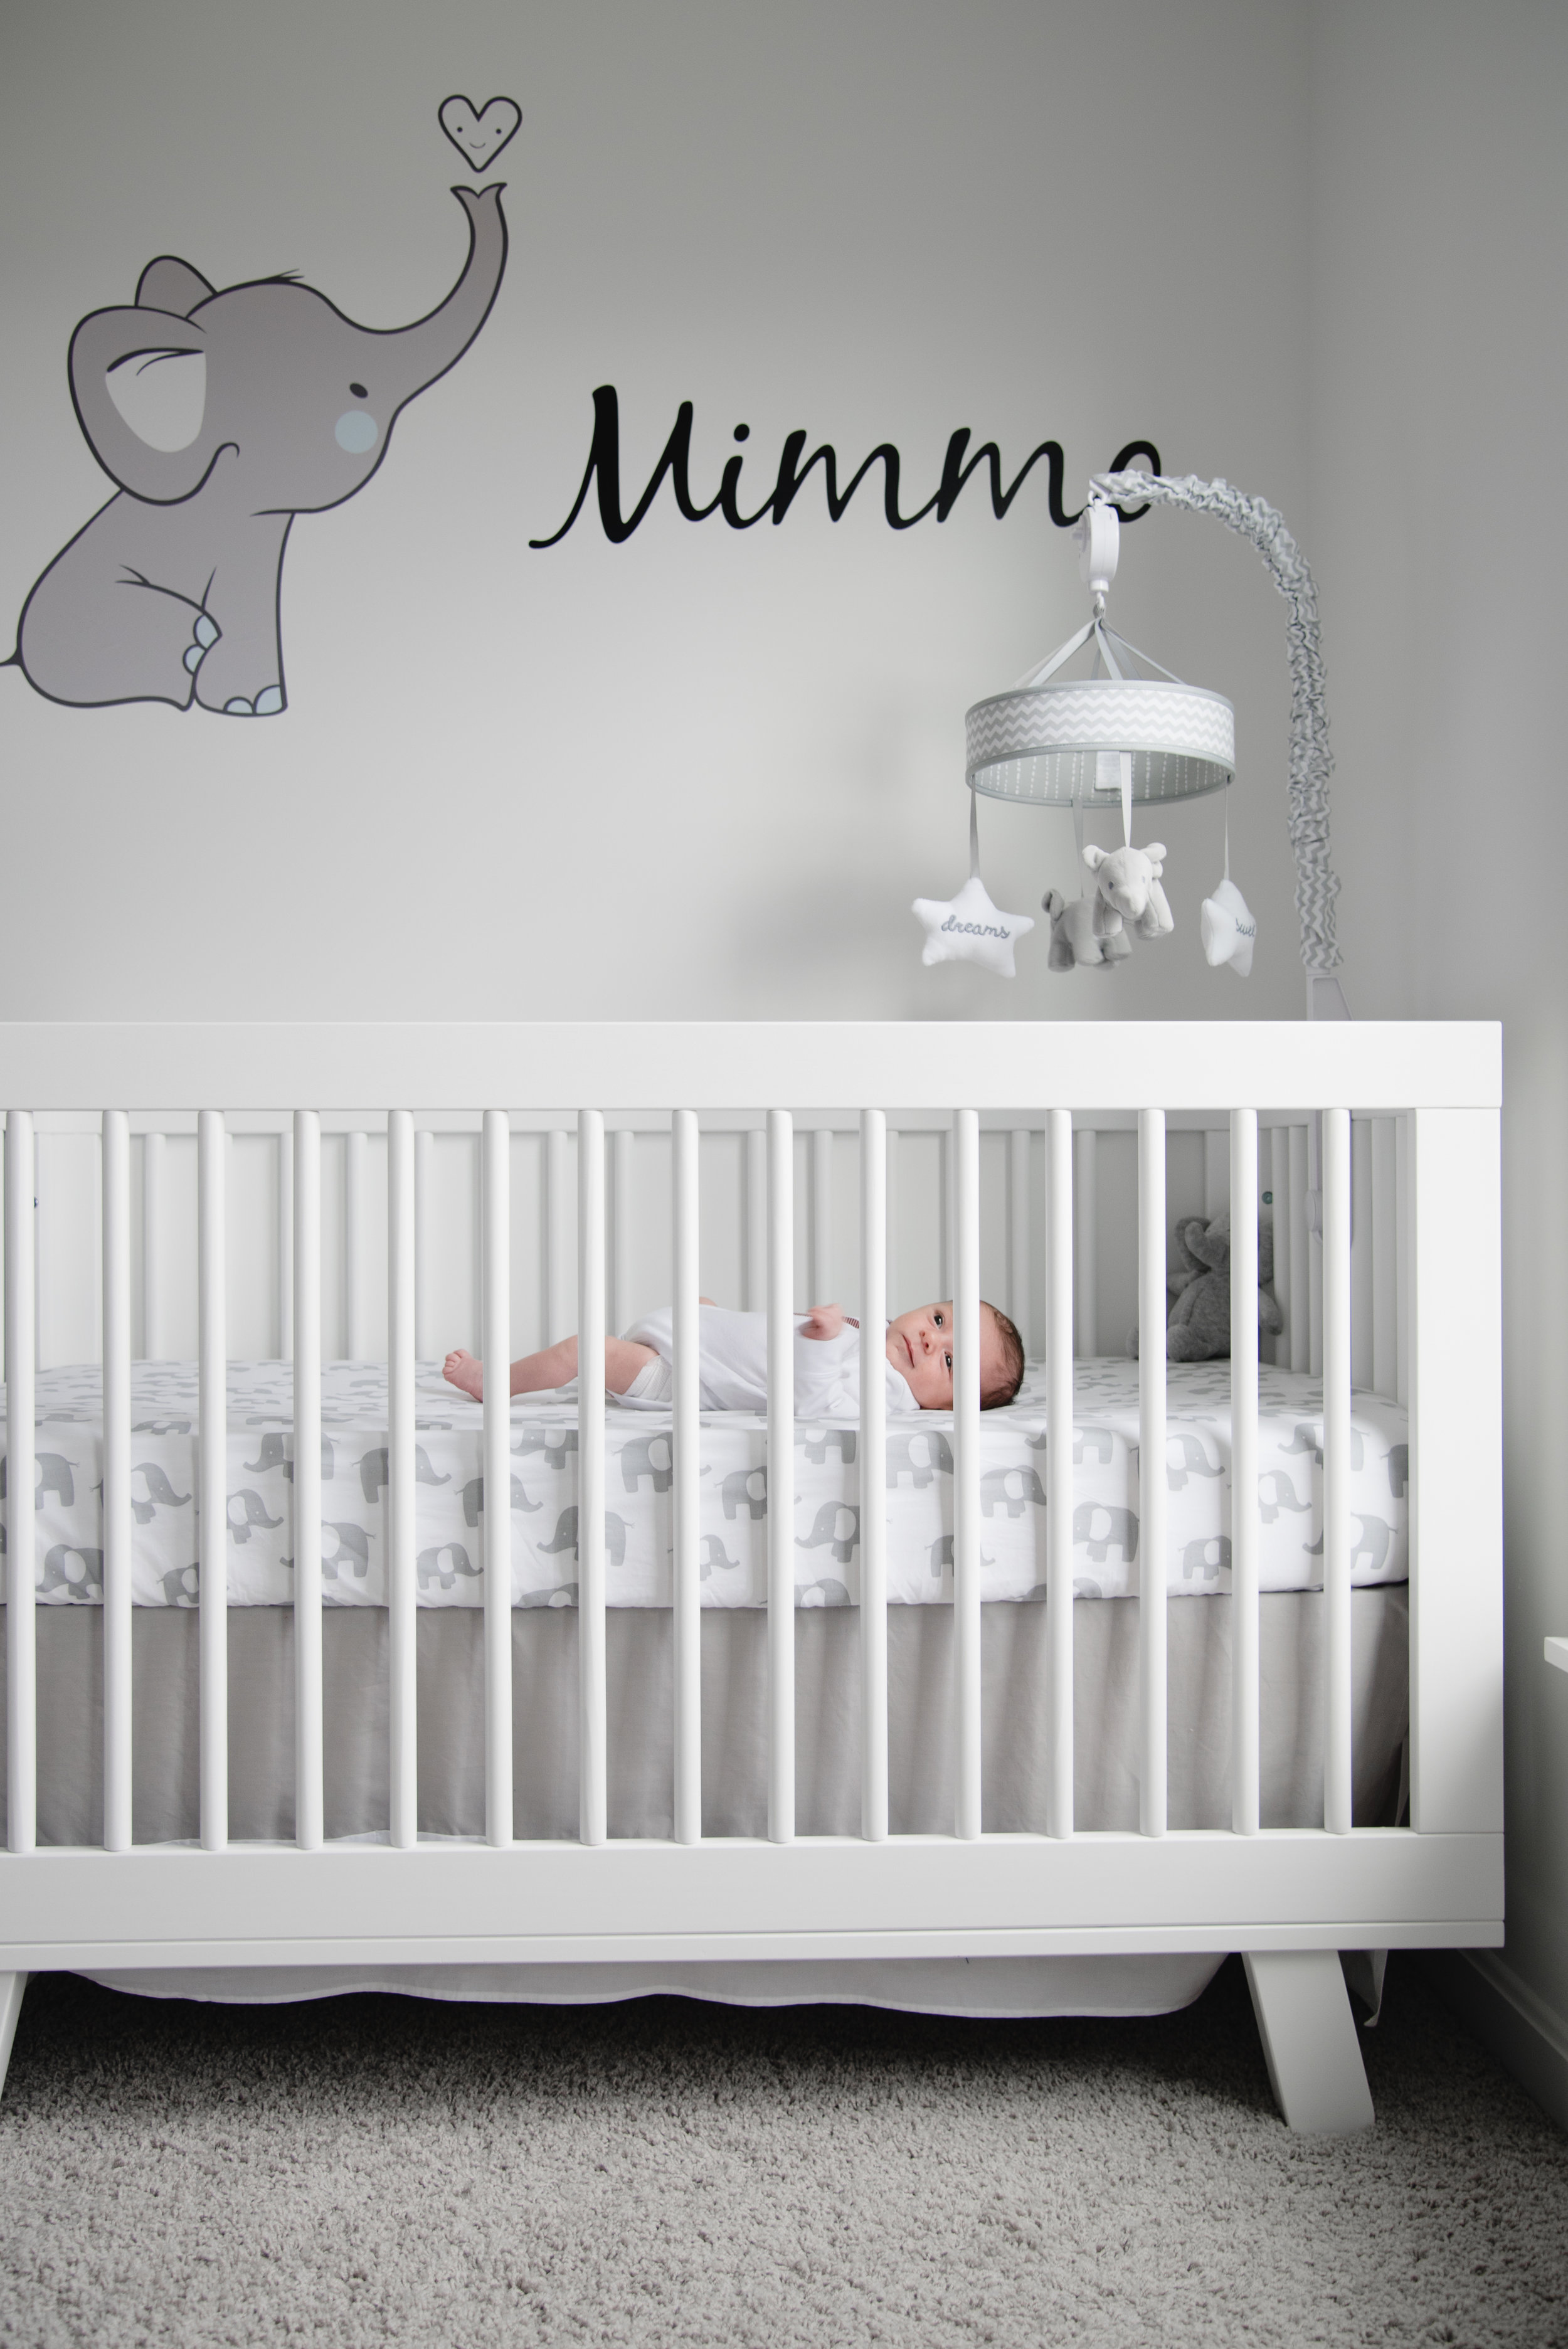 Mimmo-176.jpg